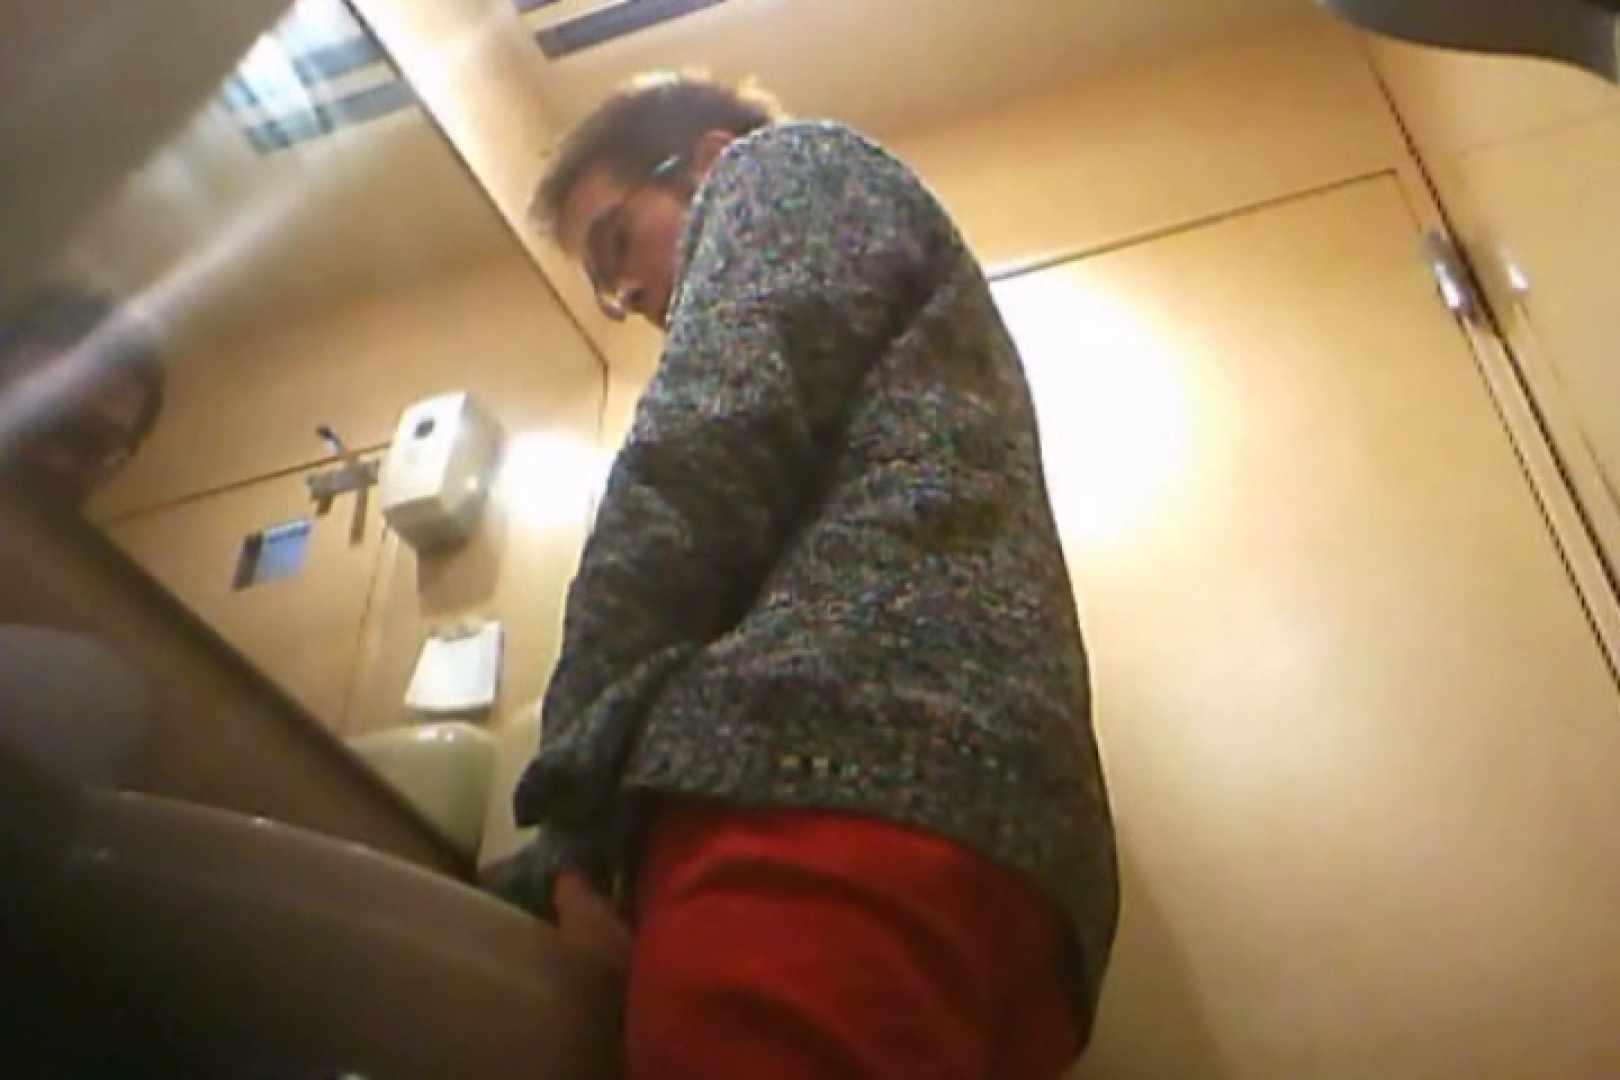 SEASON 3rd!掴み取りさんの洗面所覗き!in新幹線!VOL.21 ノンケ  108連発 88